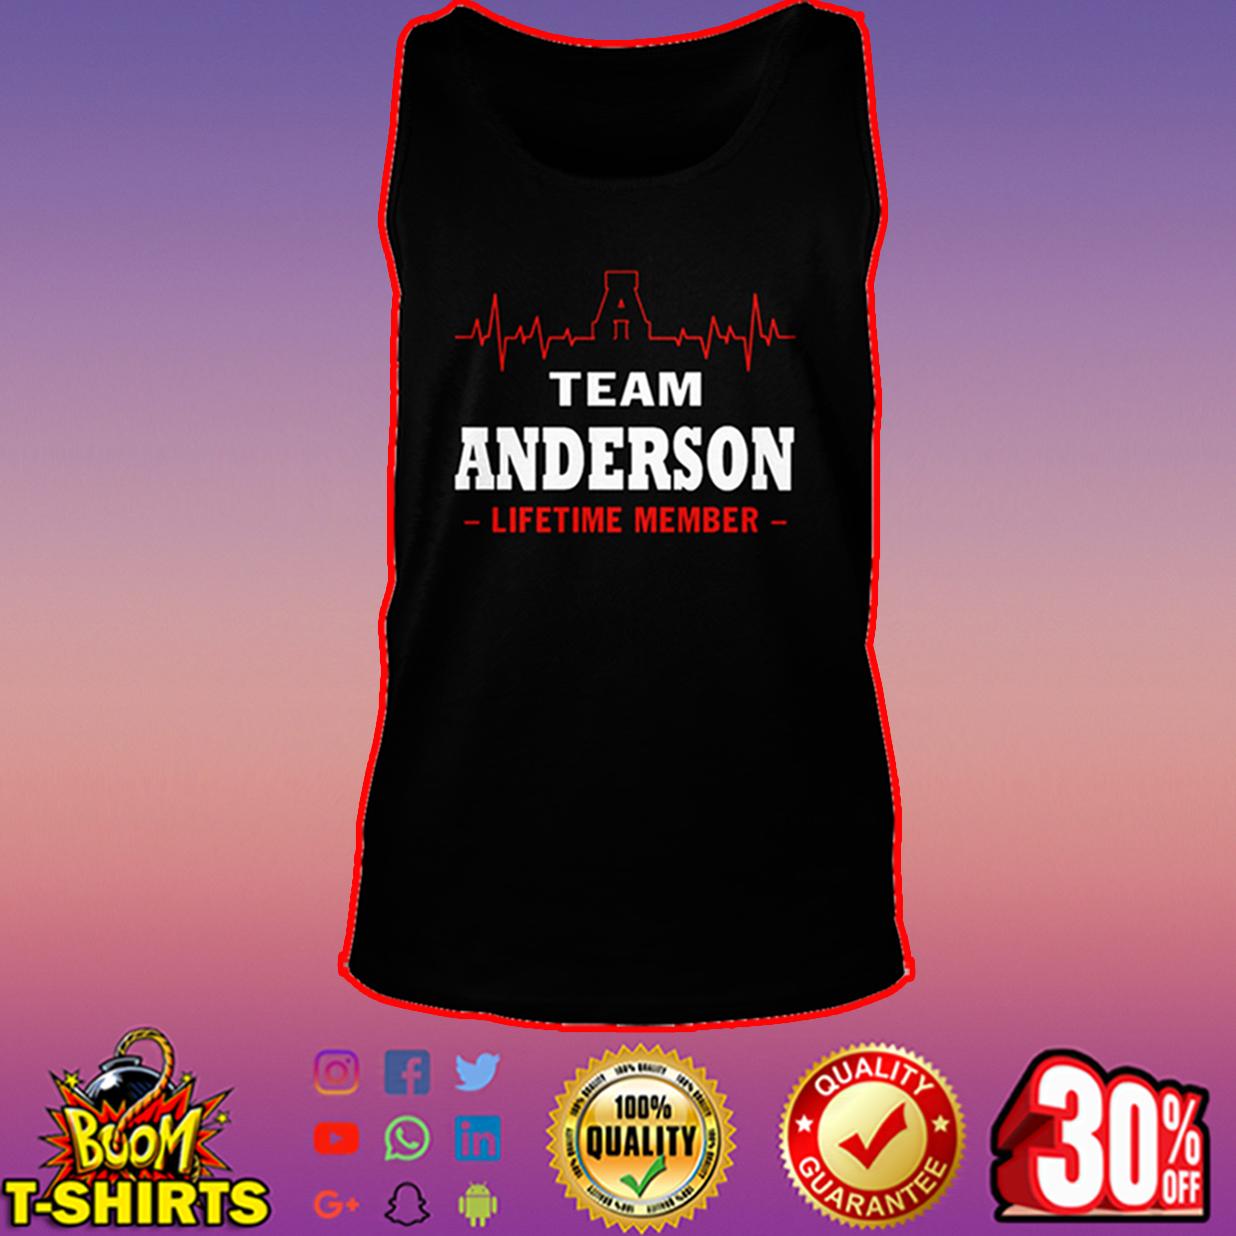 Team Anderson lifetime member tank top